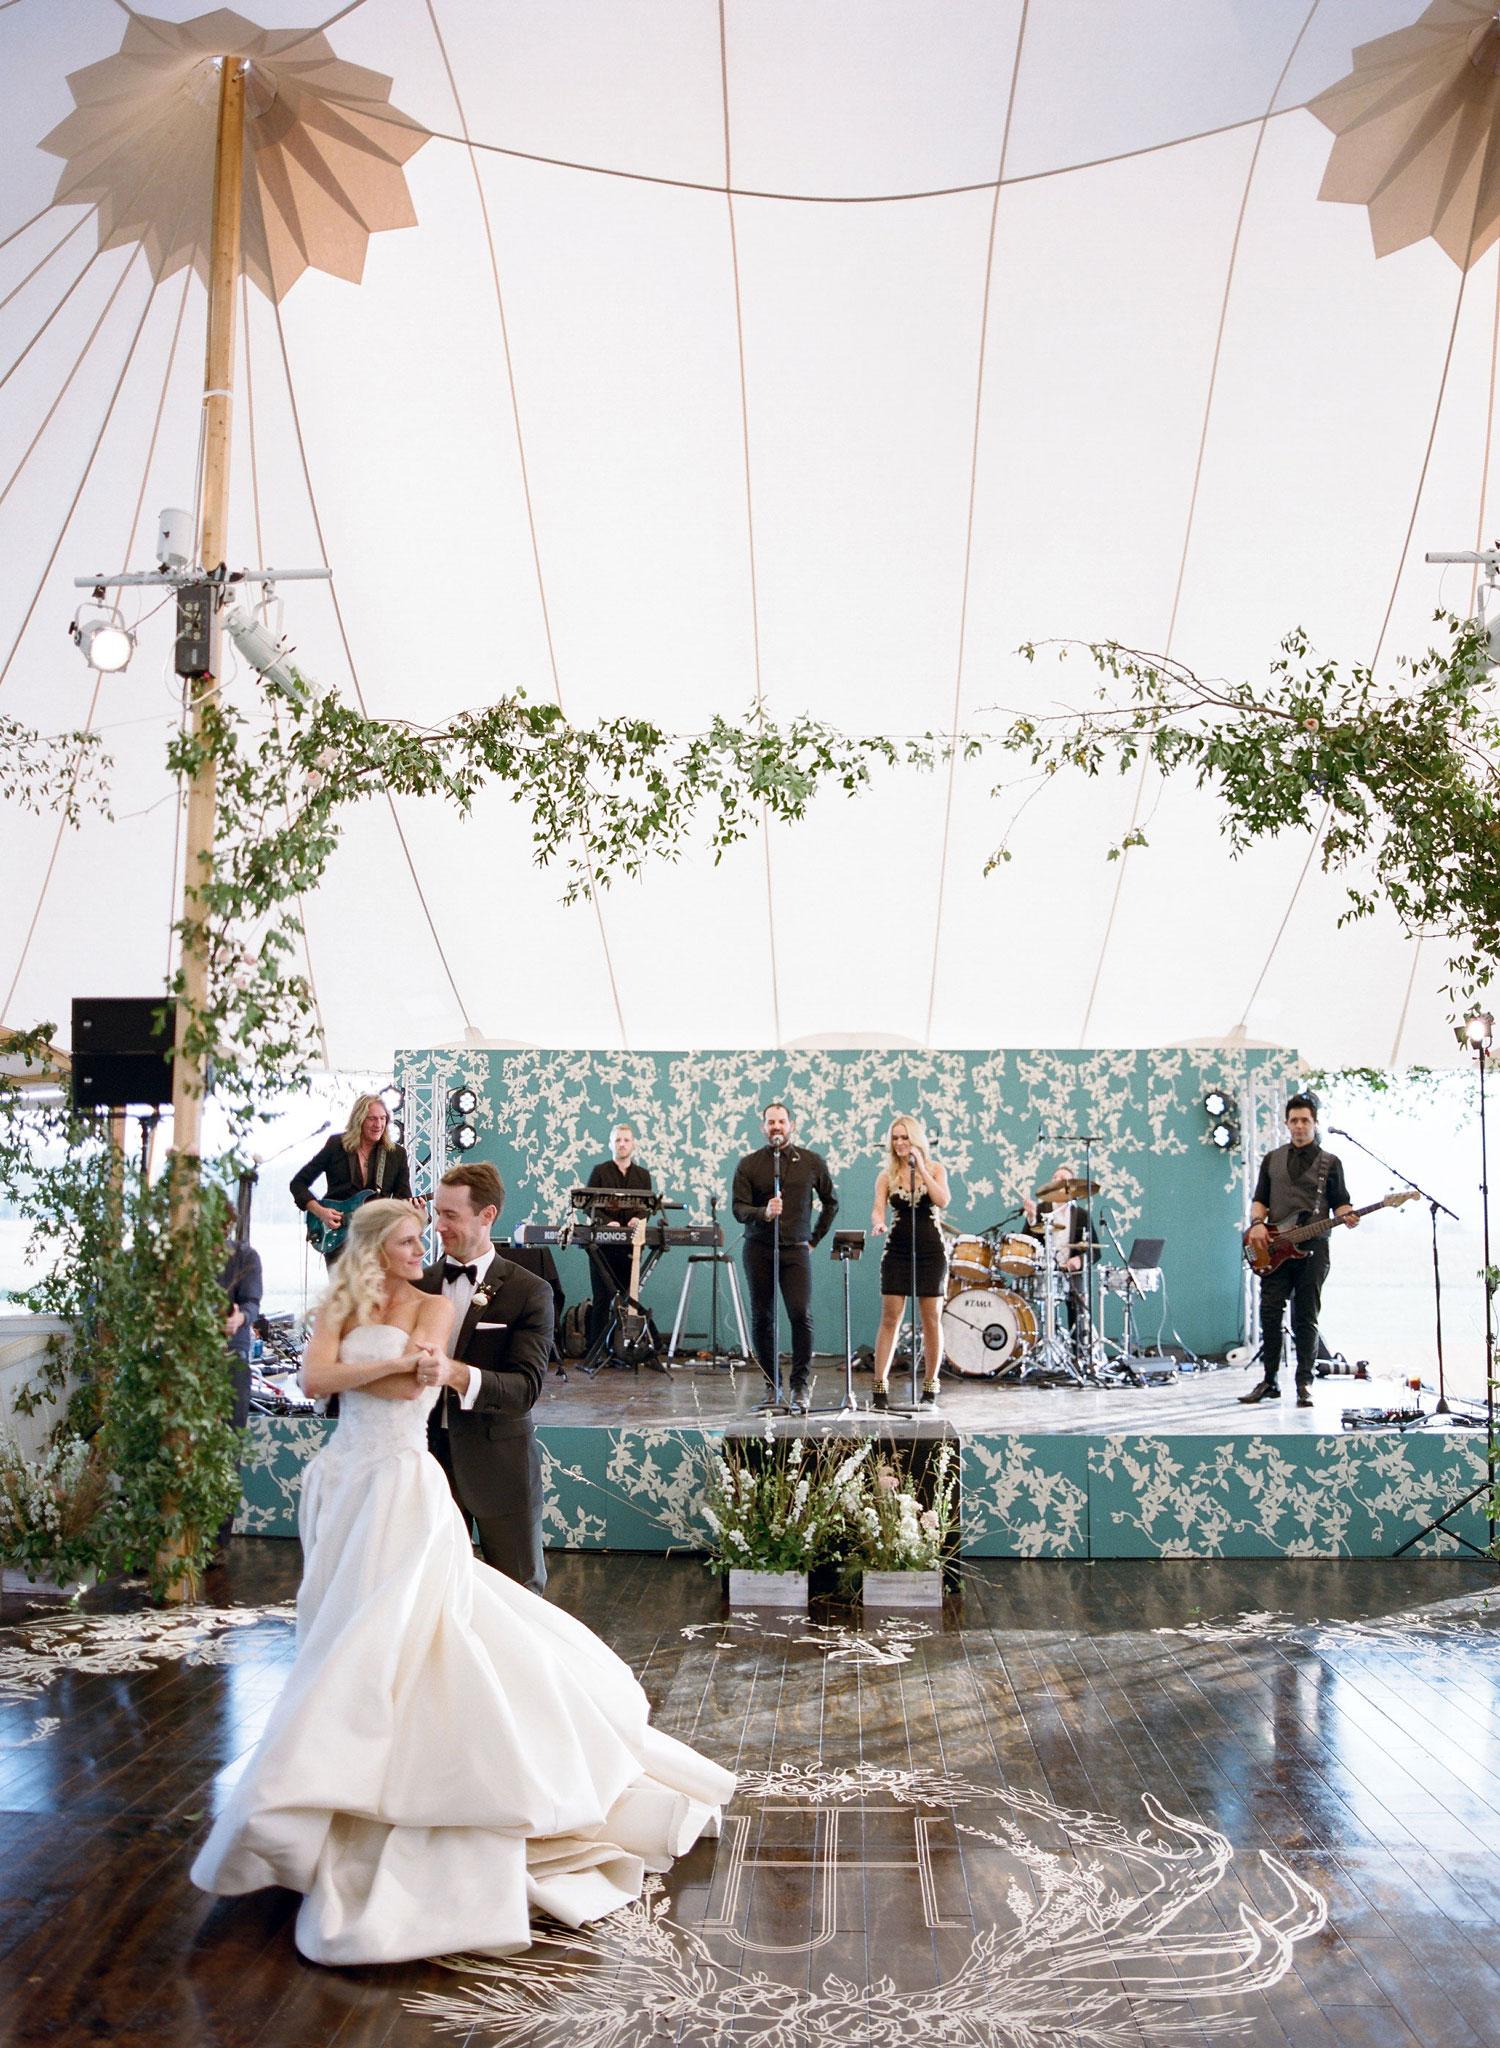 Bride and groom first dance on custom dance floor monogram stage backdrop emily clarke events